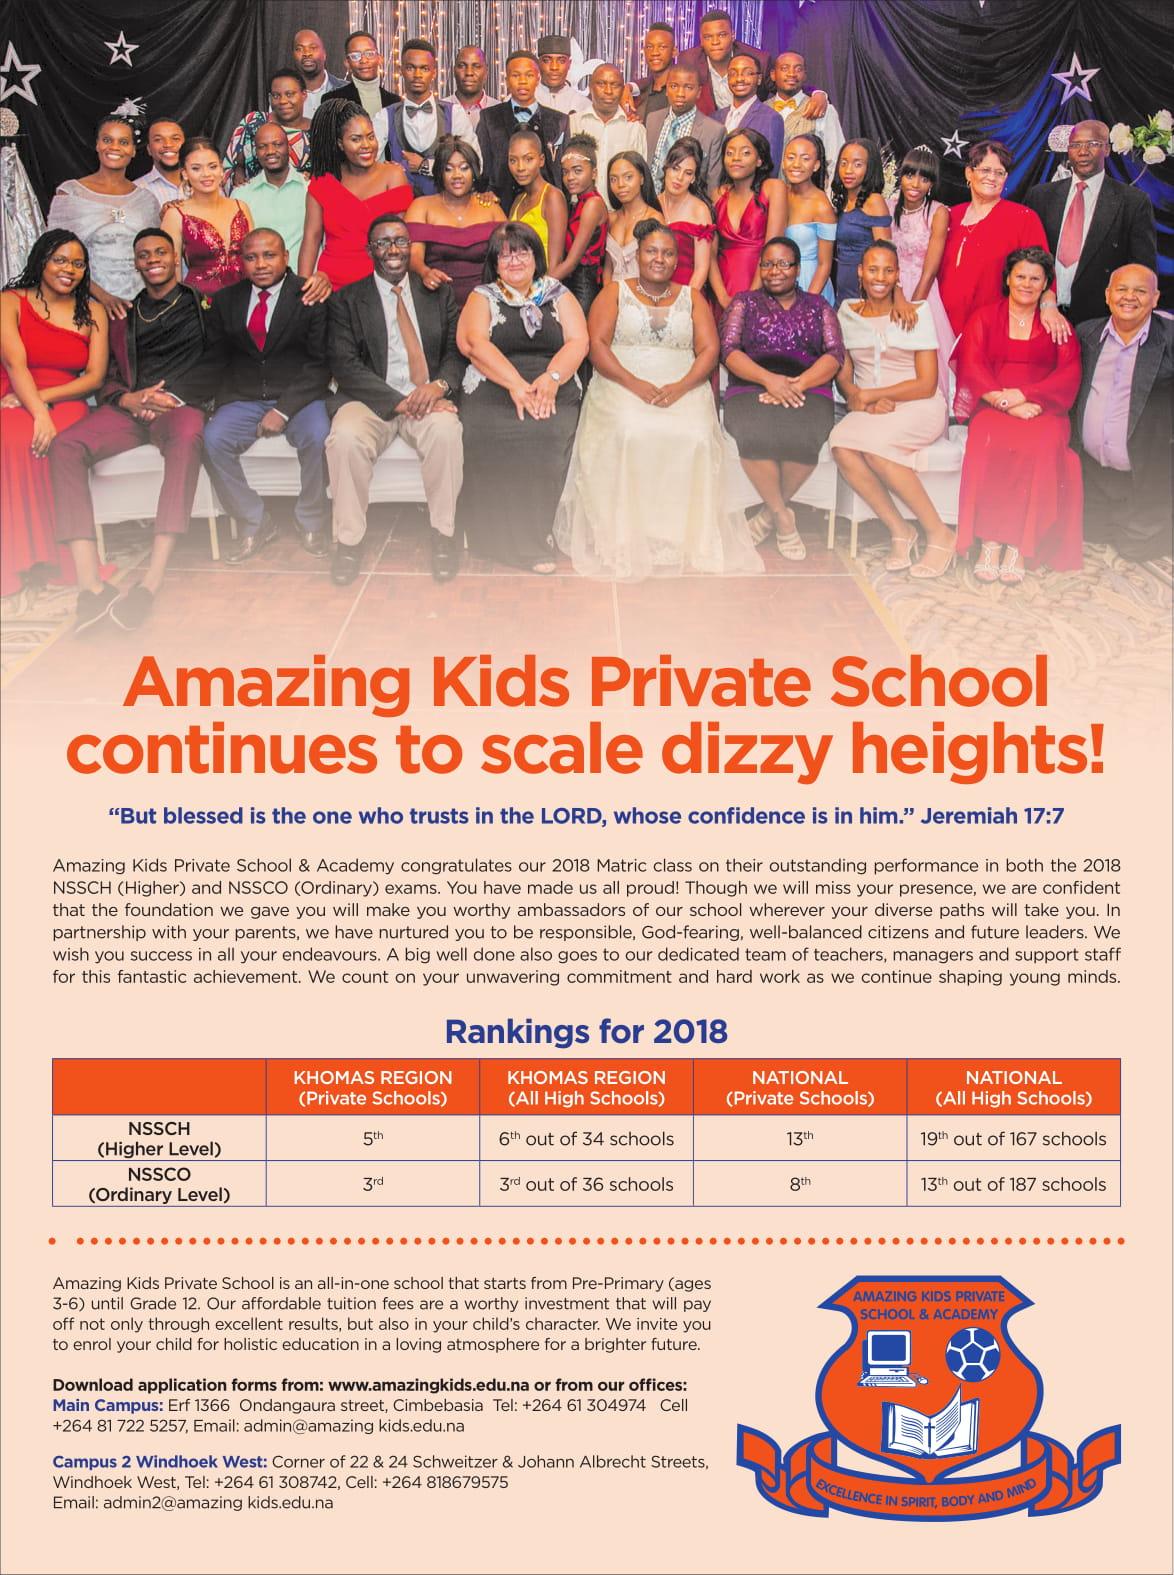 Amazing Kids Private School